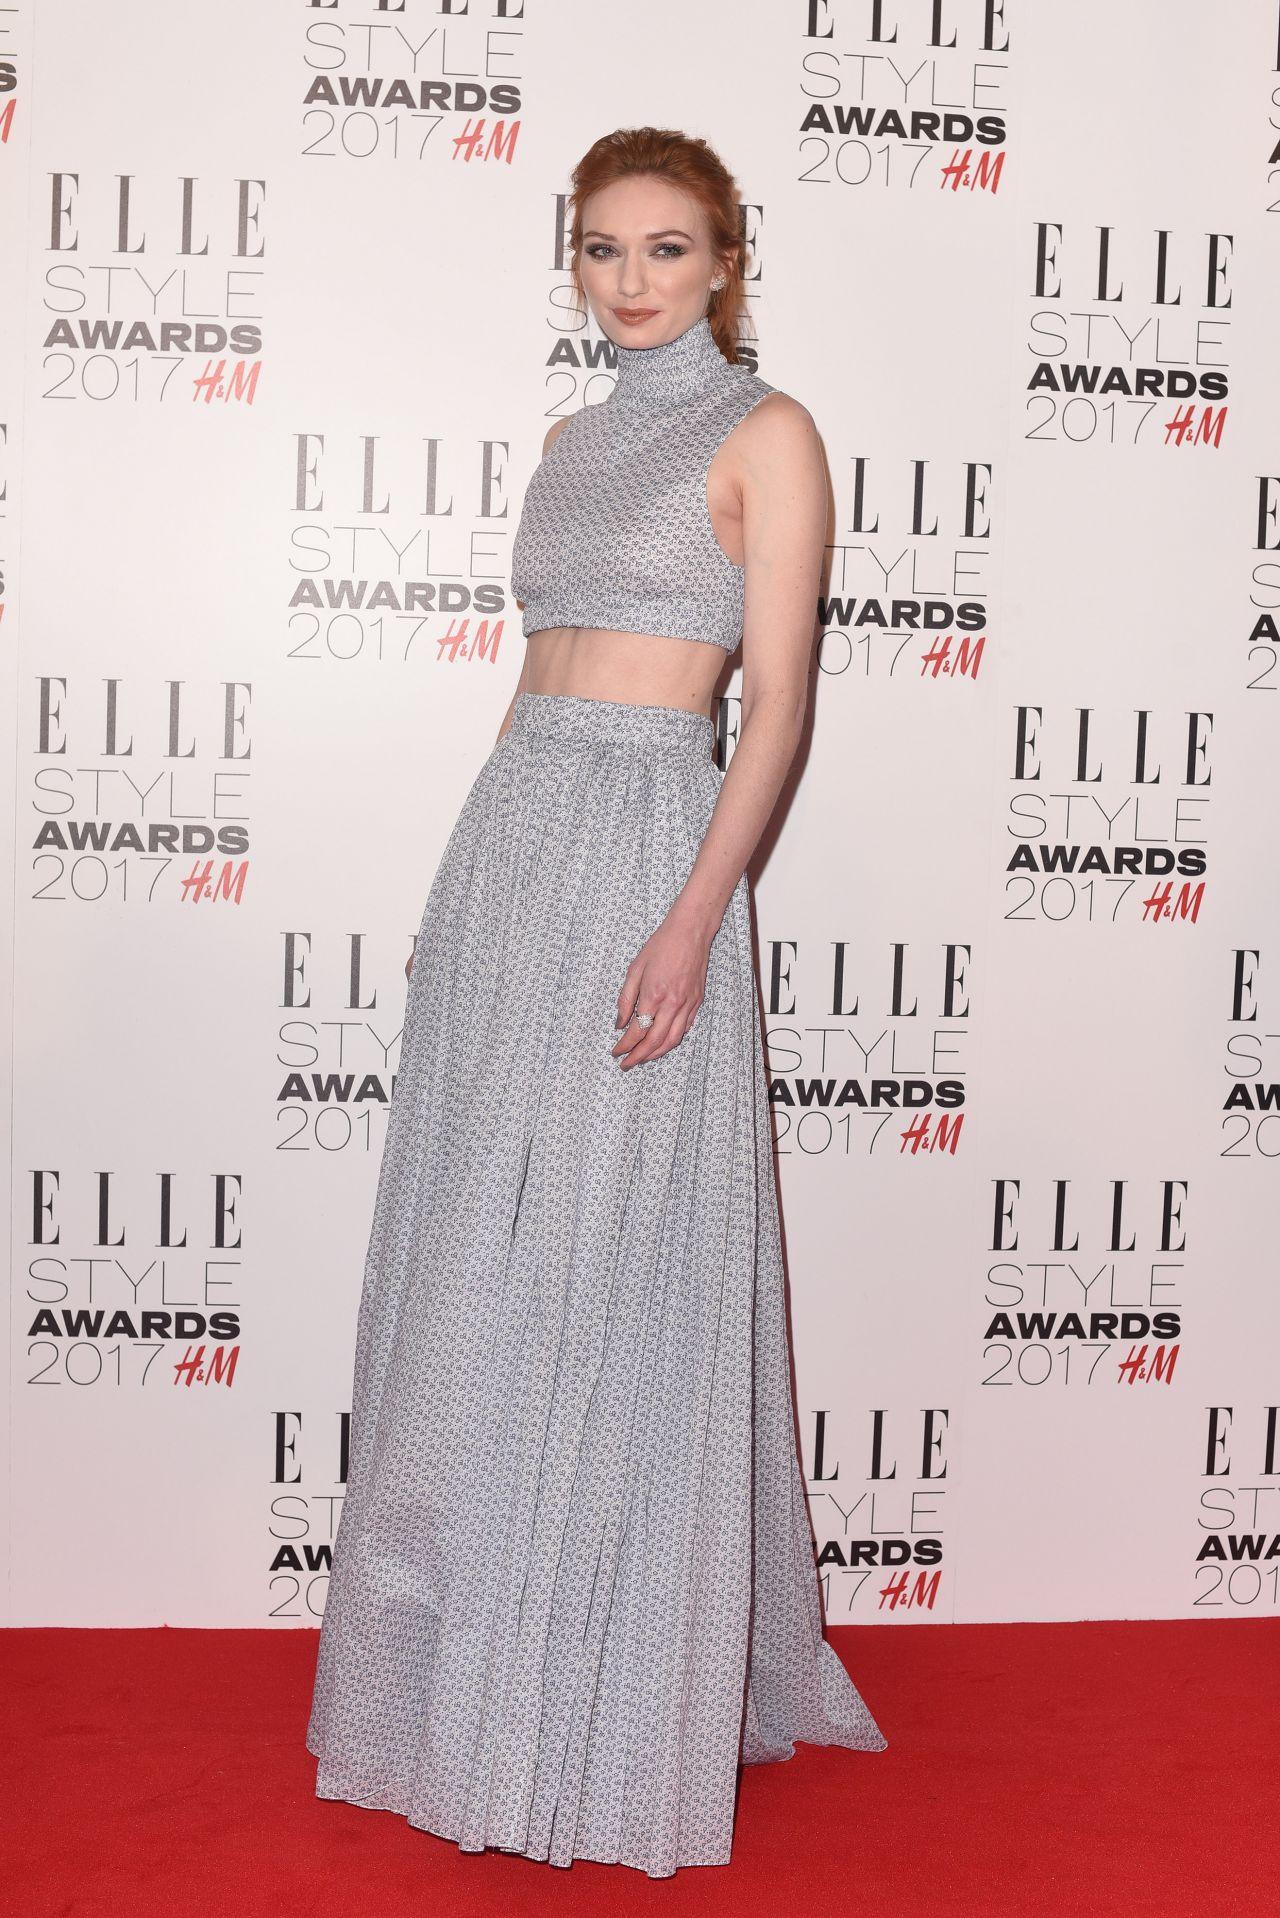 http://celebmafia.com/wp-content/uploads/2017/02/eleanor-tomlinson-elle-style-awards-in-london-2-13-2017-3.jpg